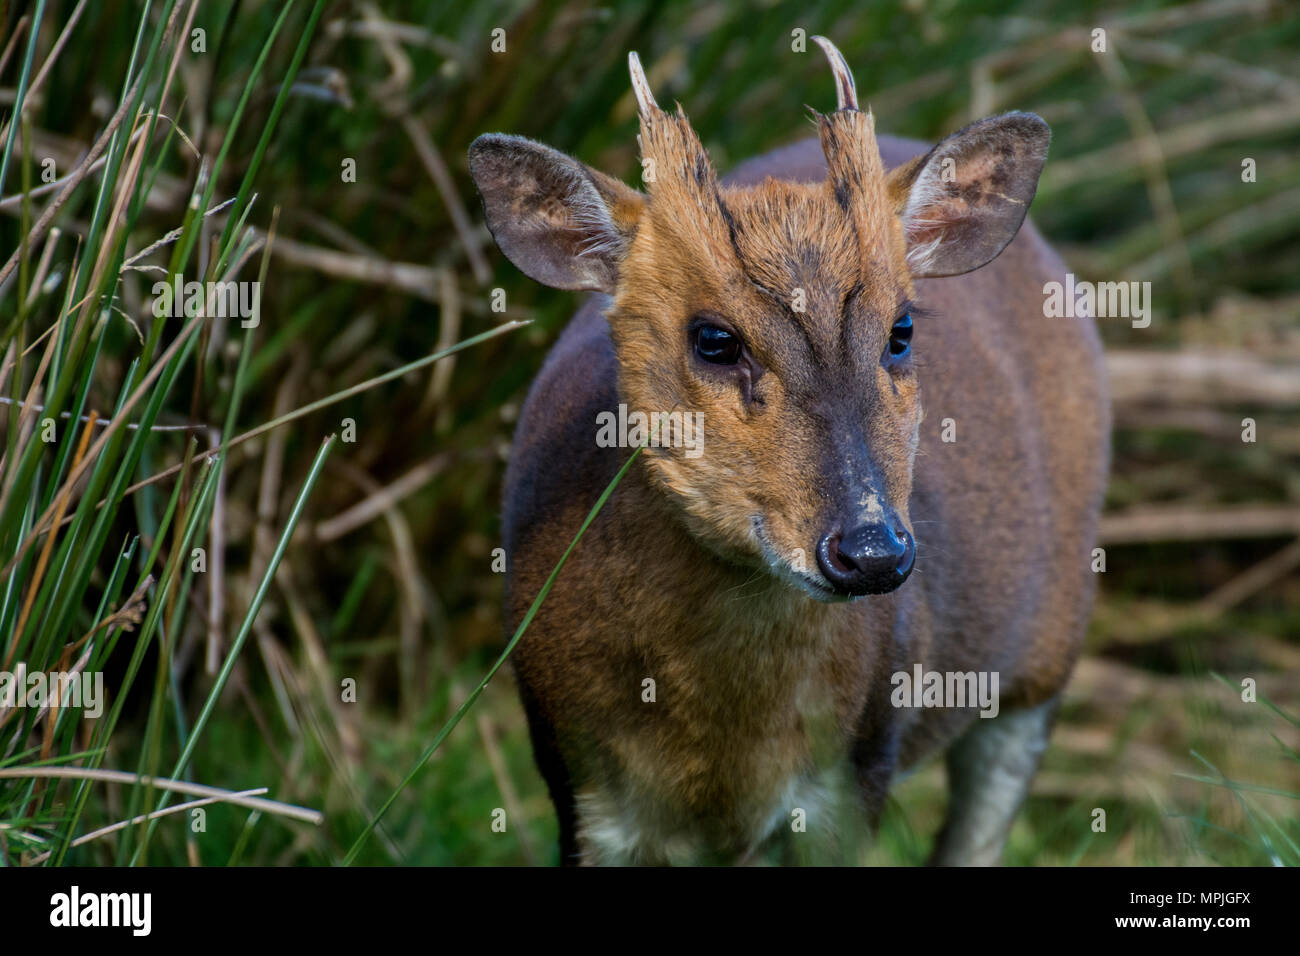 Wild muntjac deer in long grass - Stock Image